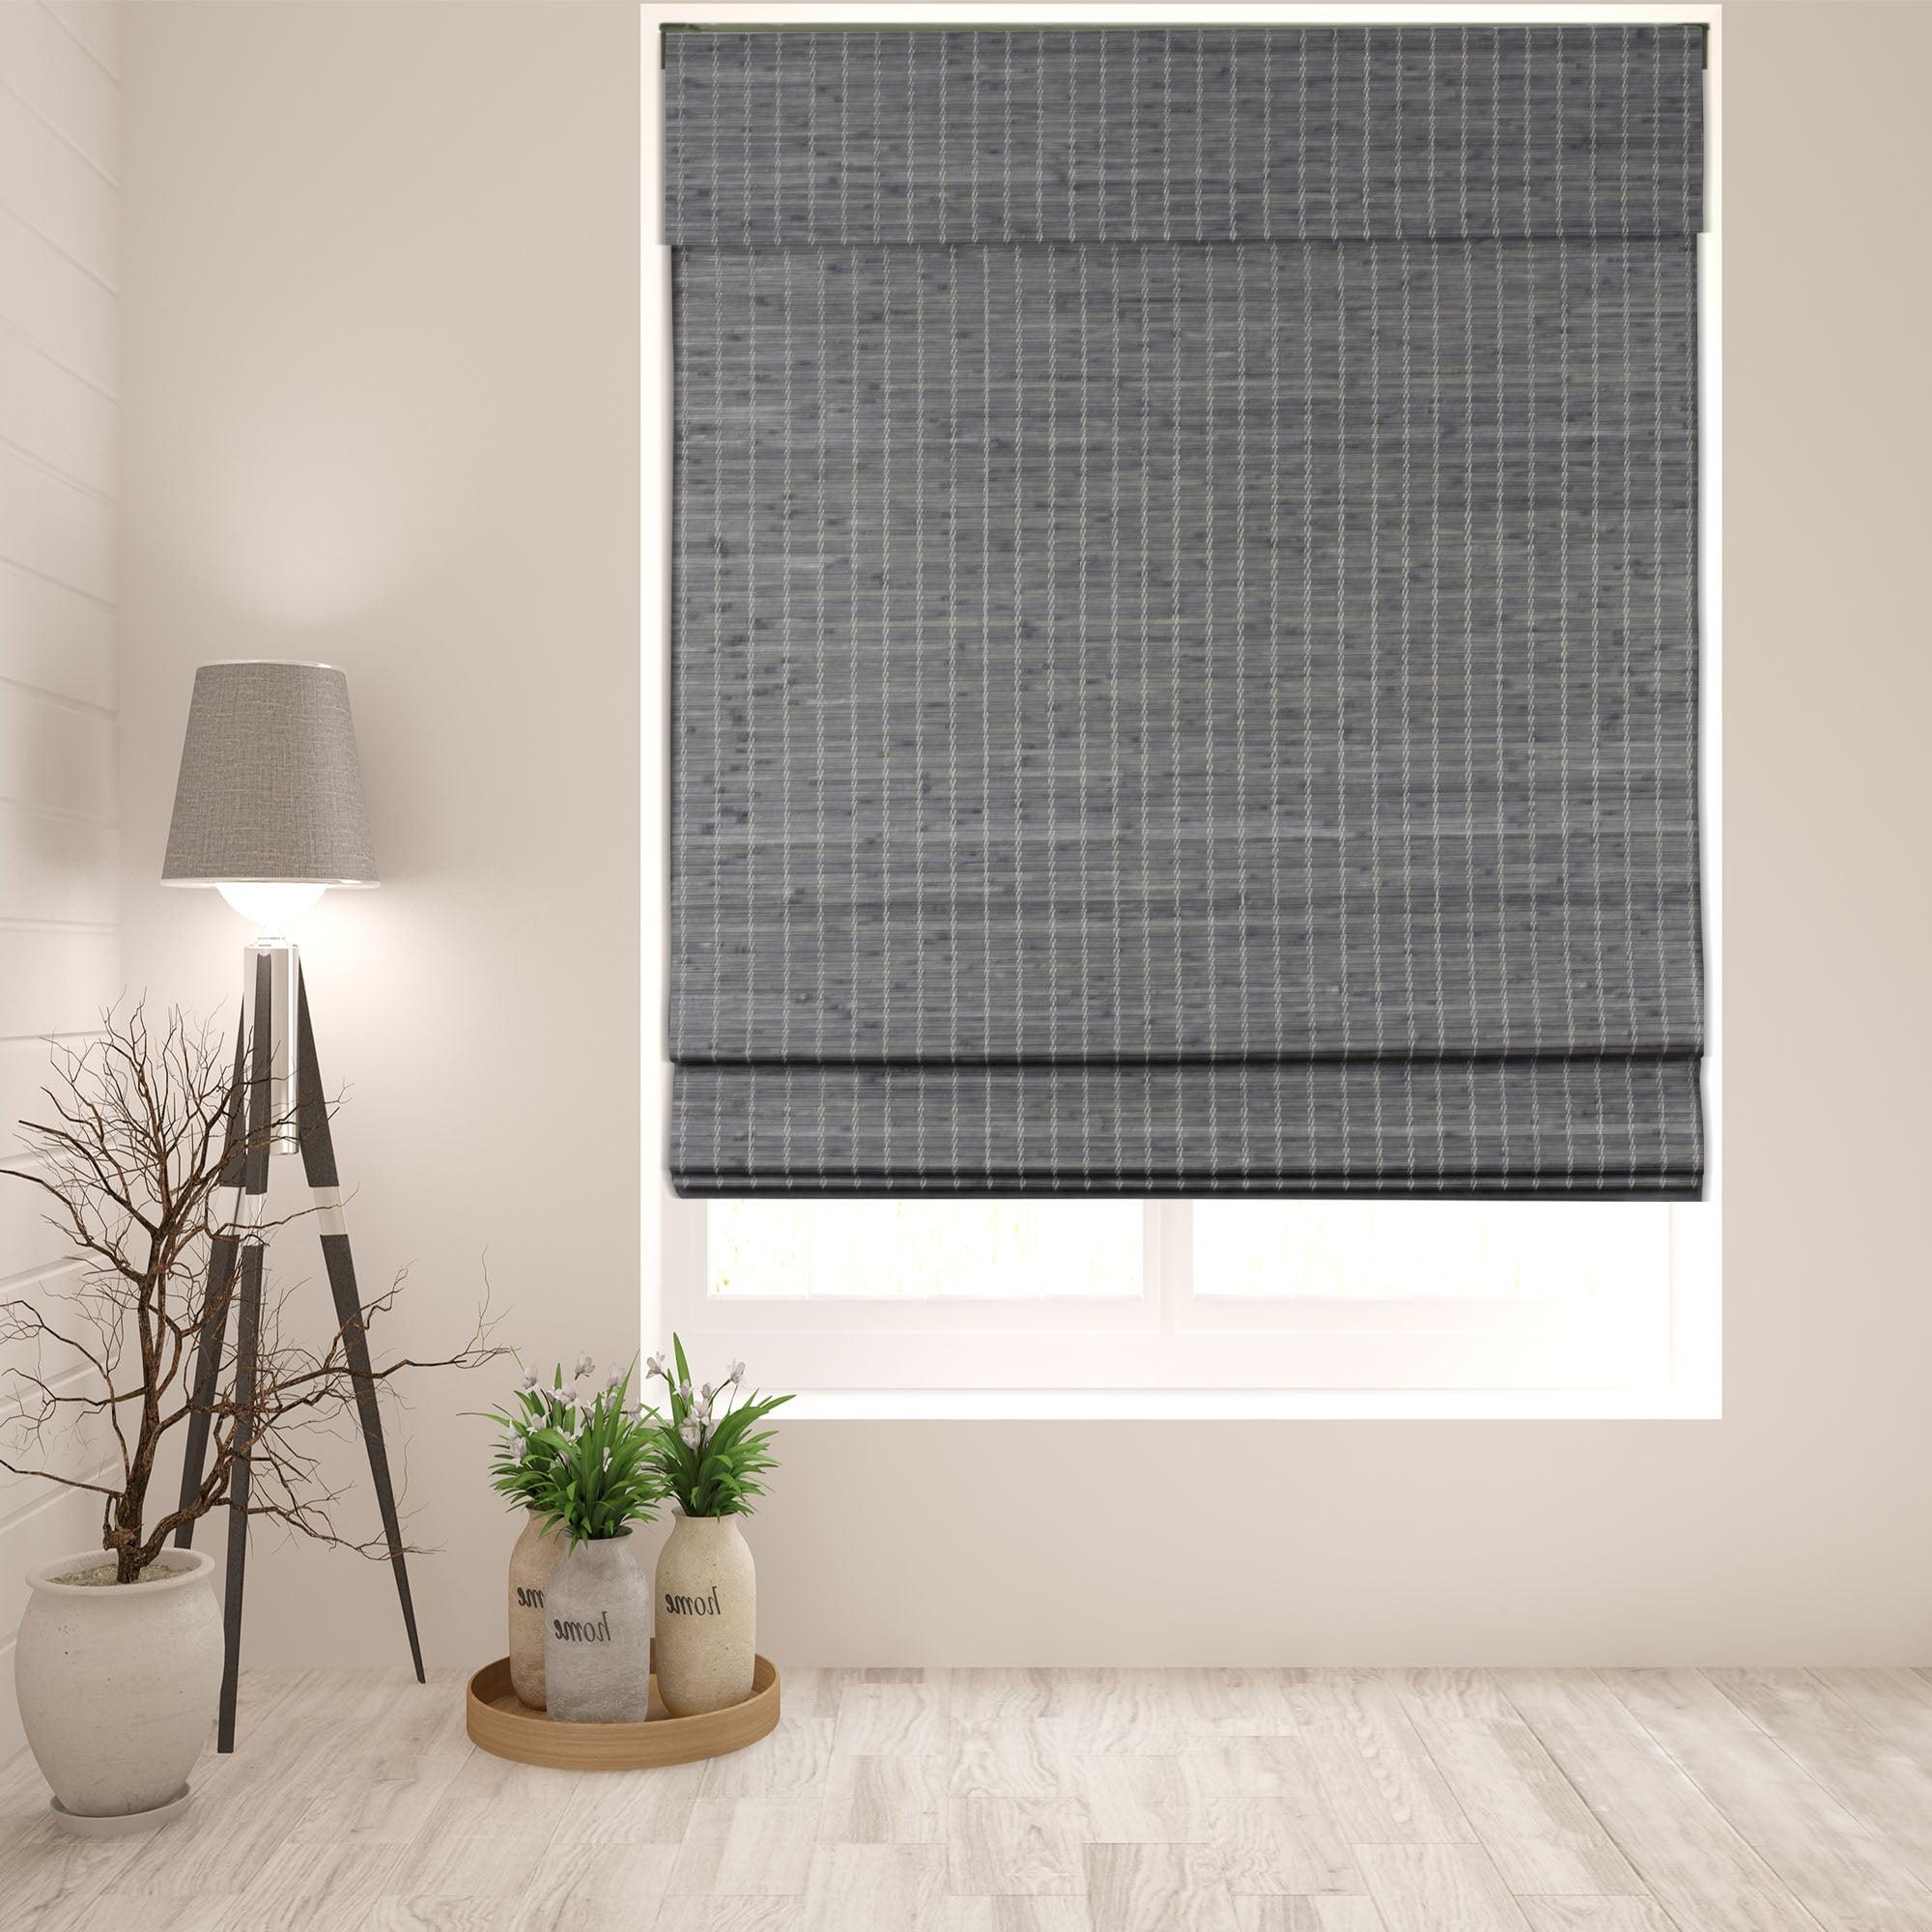 Arlo Blinds Cordless Semi Privacy Grey Brown Bamboo Roman Shade Size 18 W X 60 H Walmart Com Walmart Com